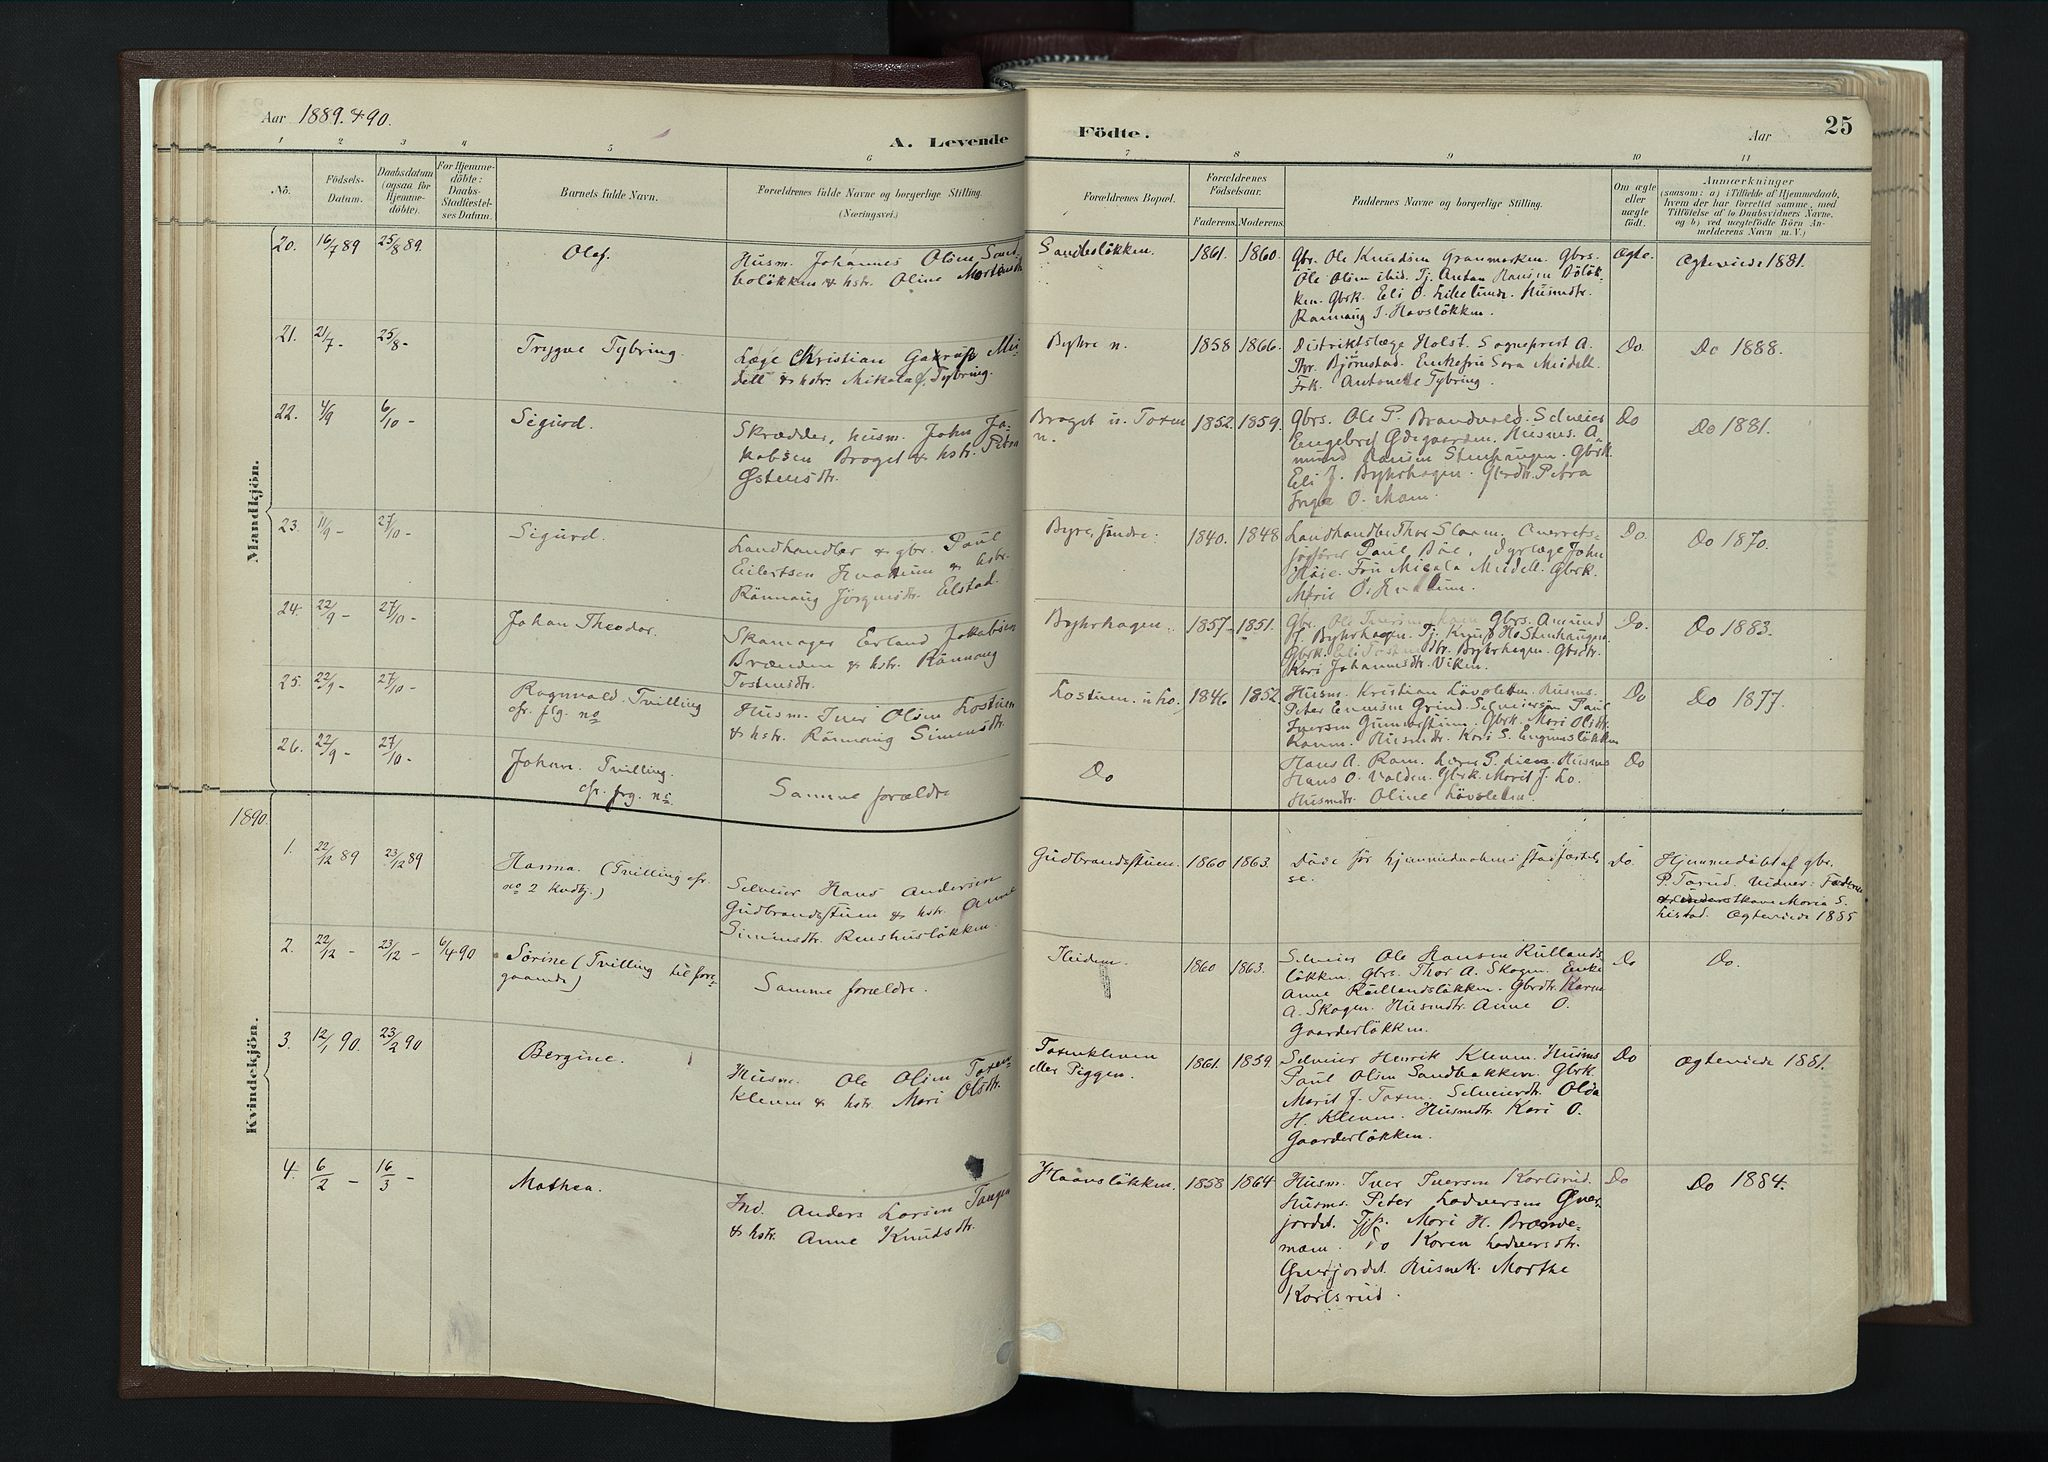 SAH, Nord-Fron prestekontor, Ministerialbok nr. 4, 1884-1914, s. 25